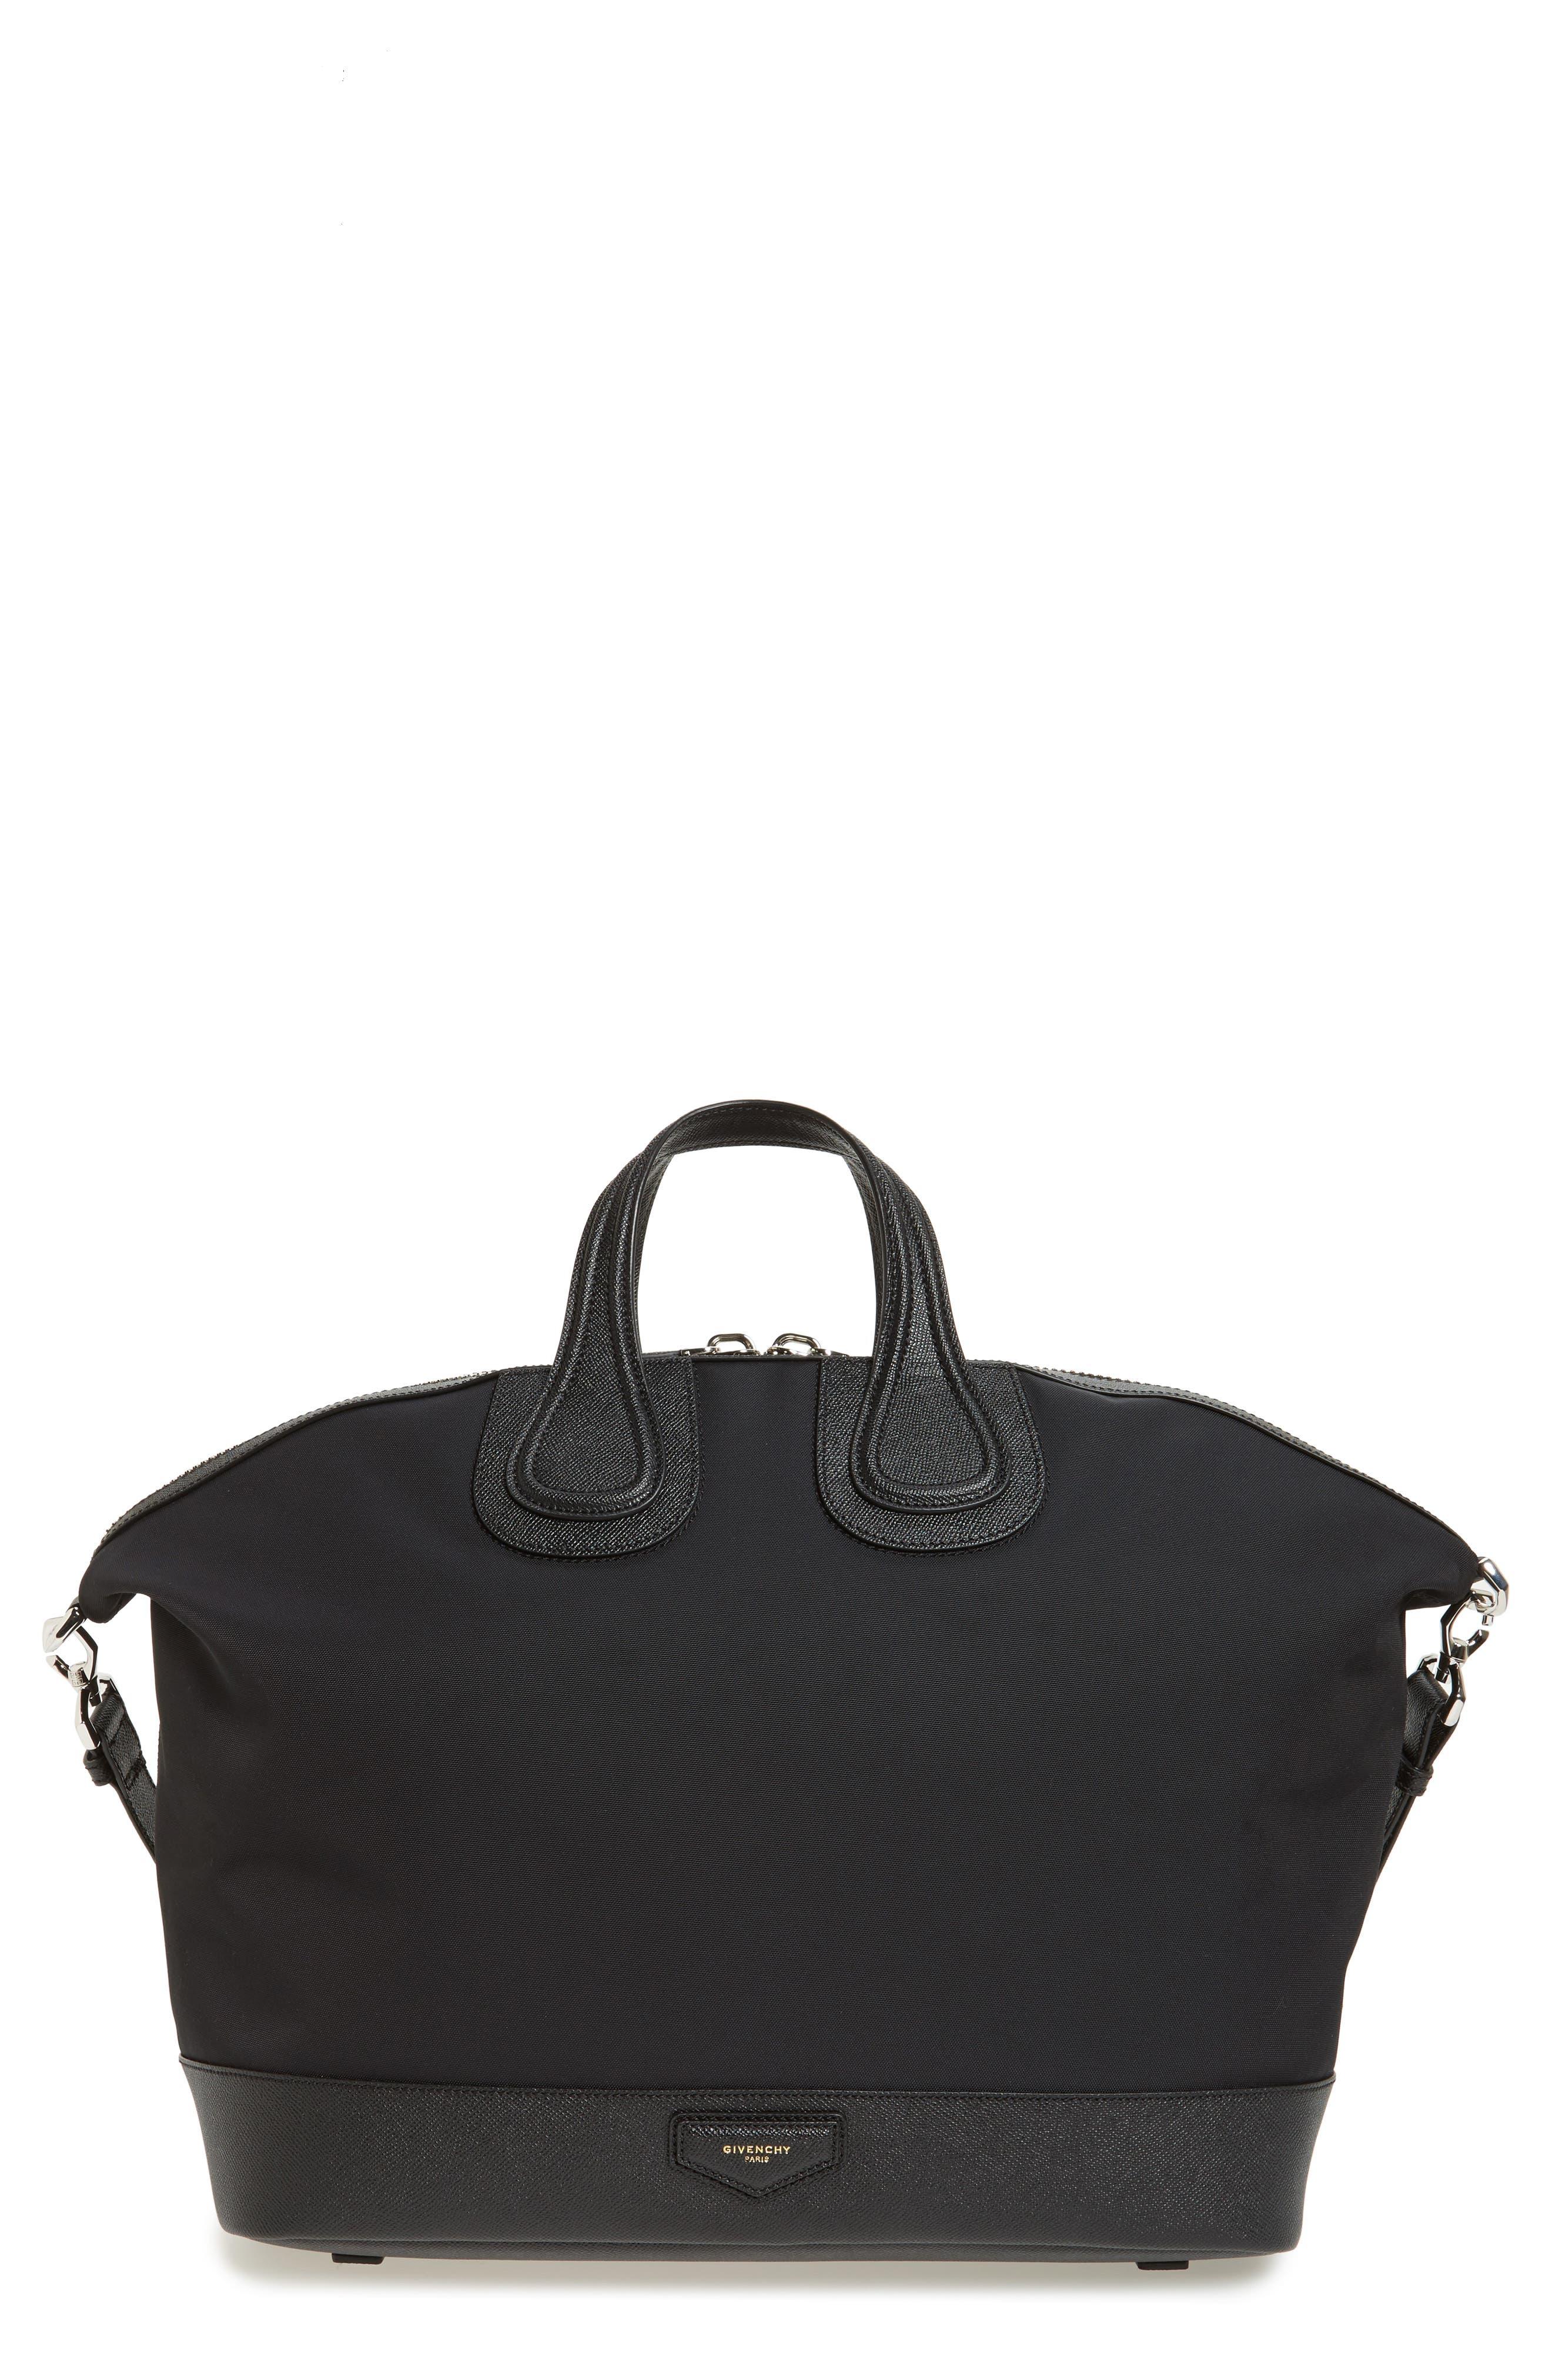 Nightingale Canvas Bag,                         Main,                         color, Black